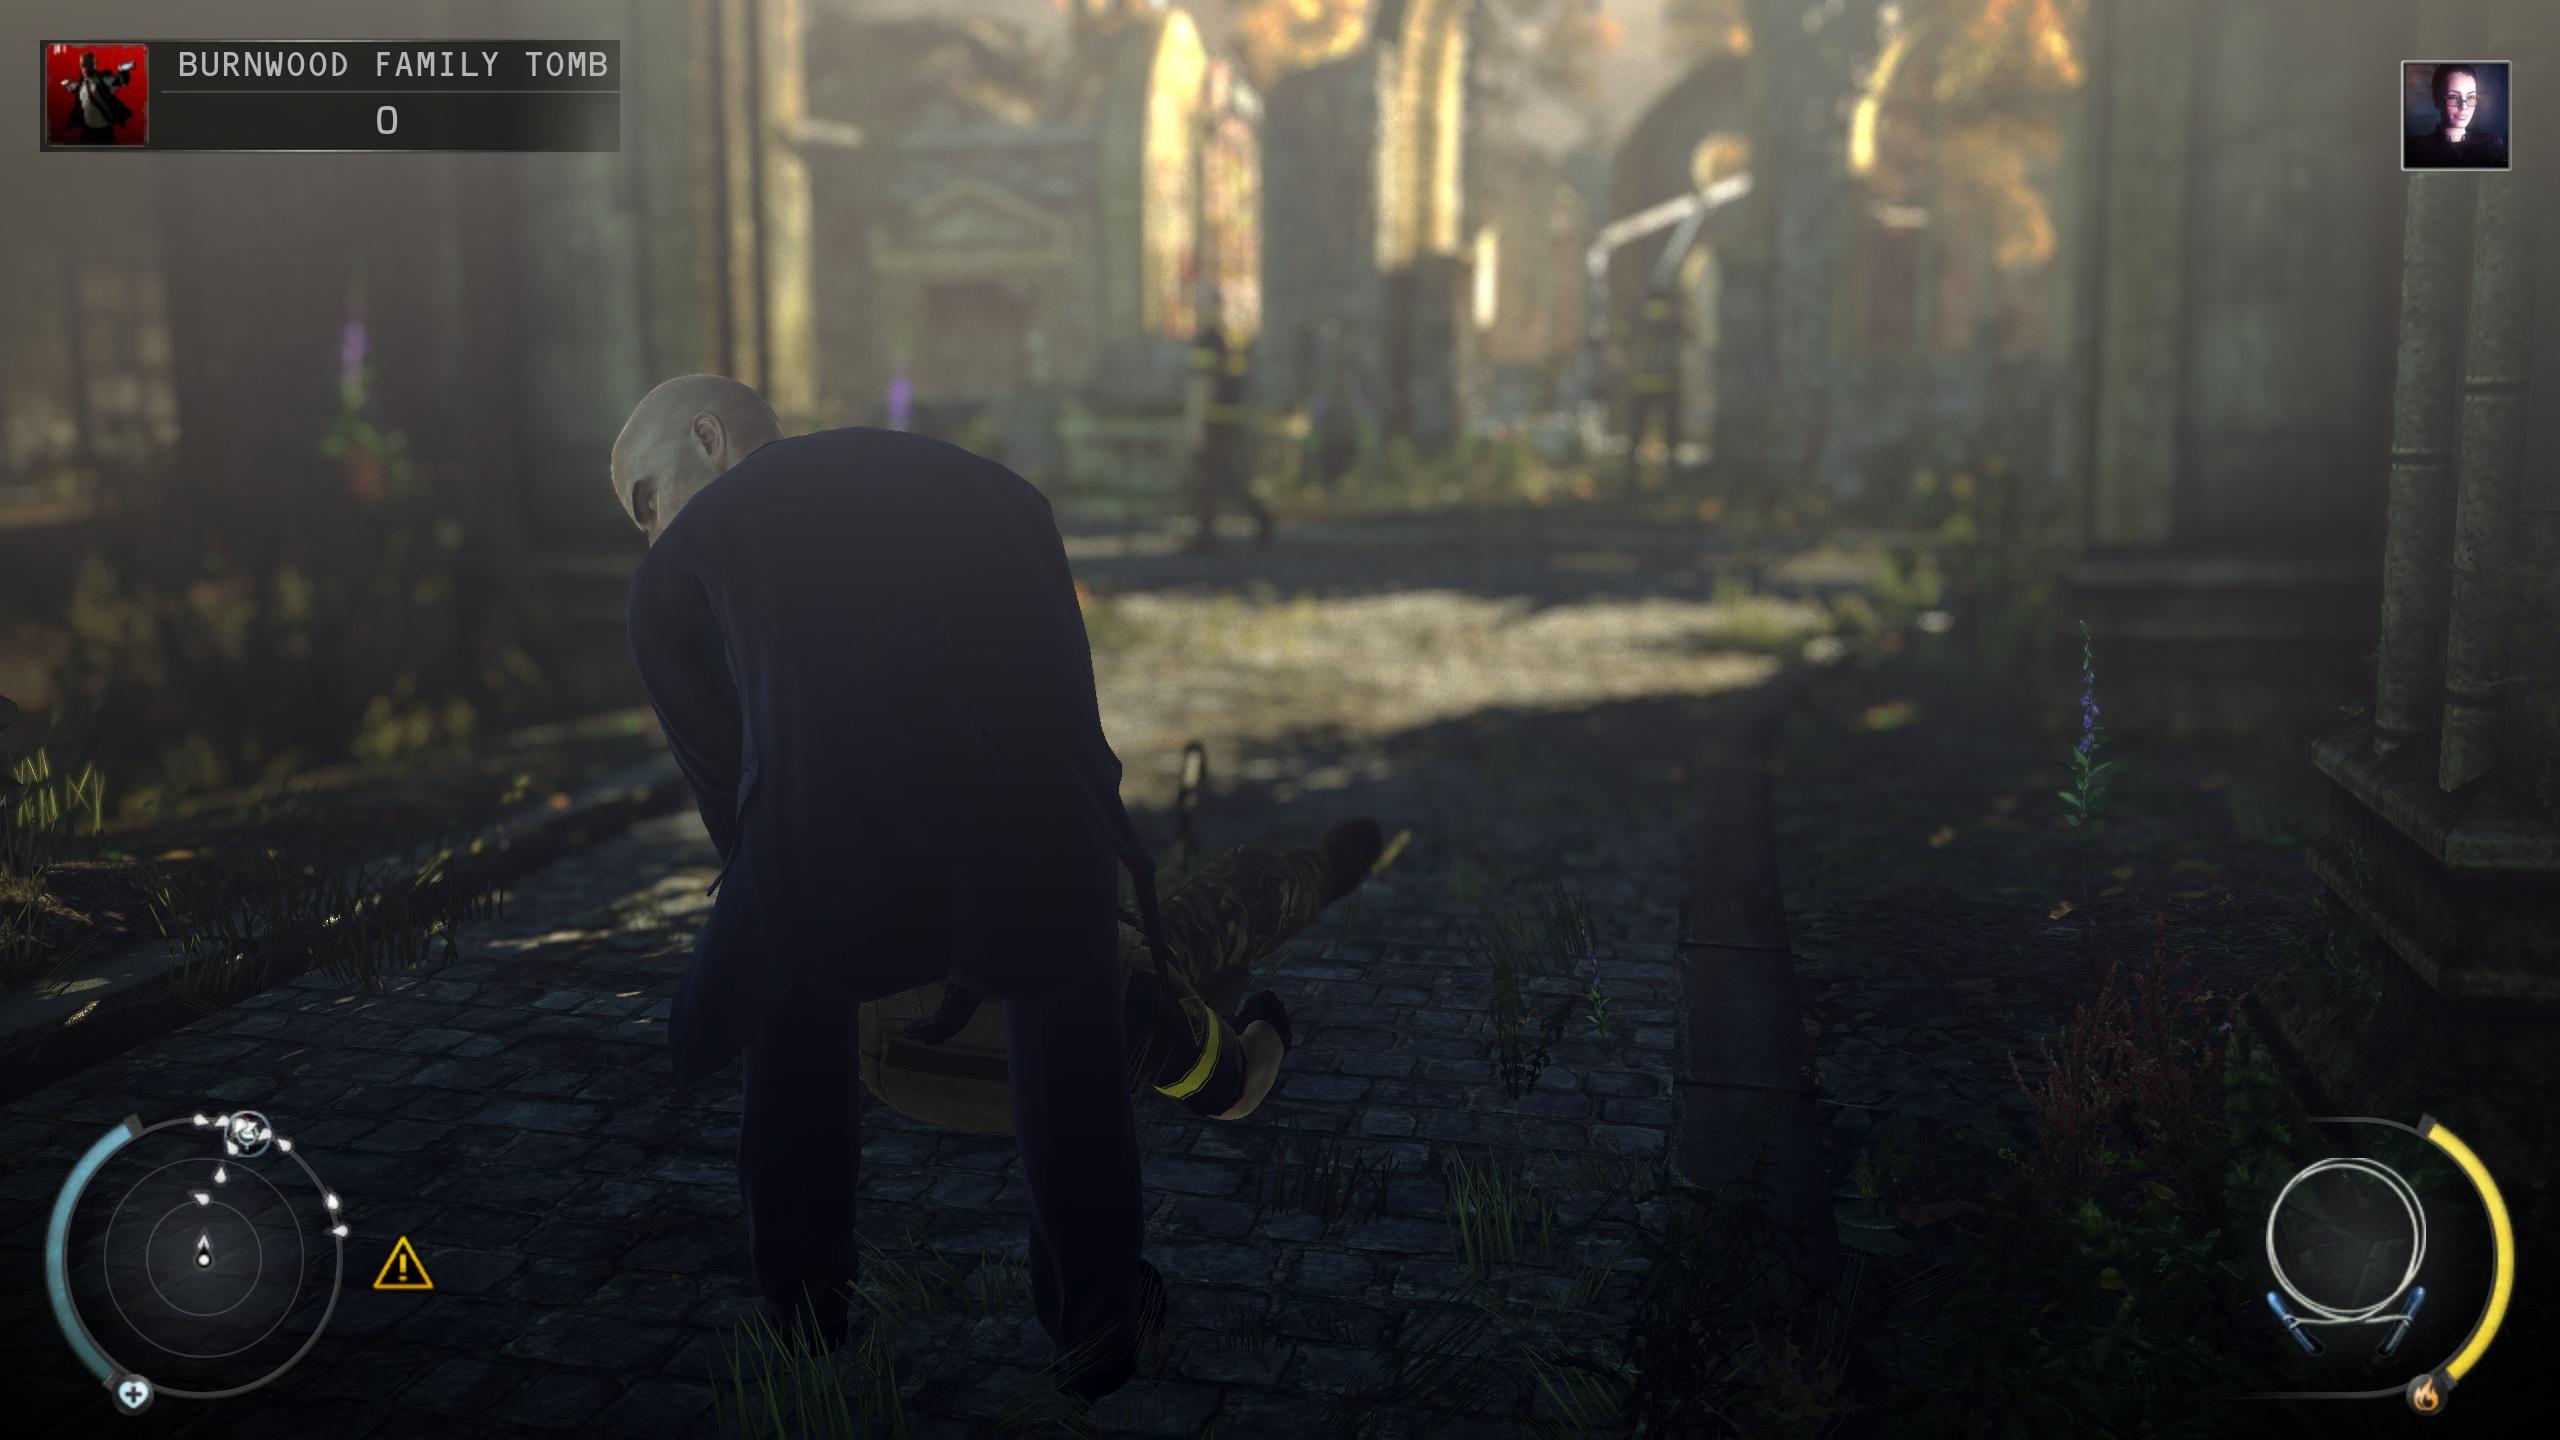 47 dragging someone's unconscious body